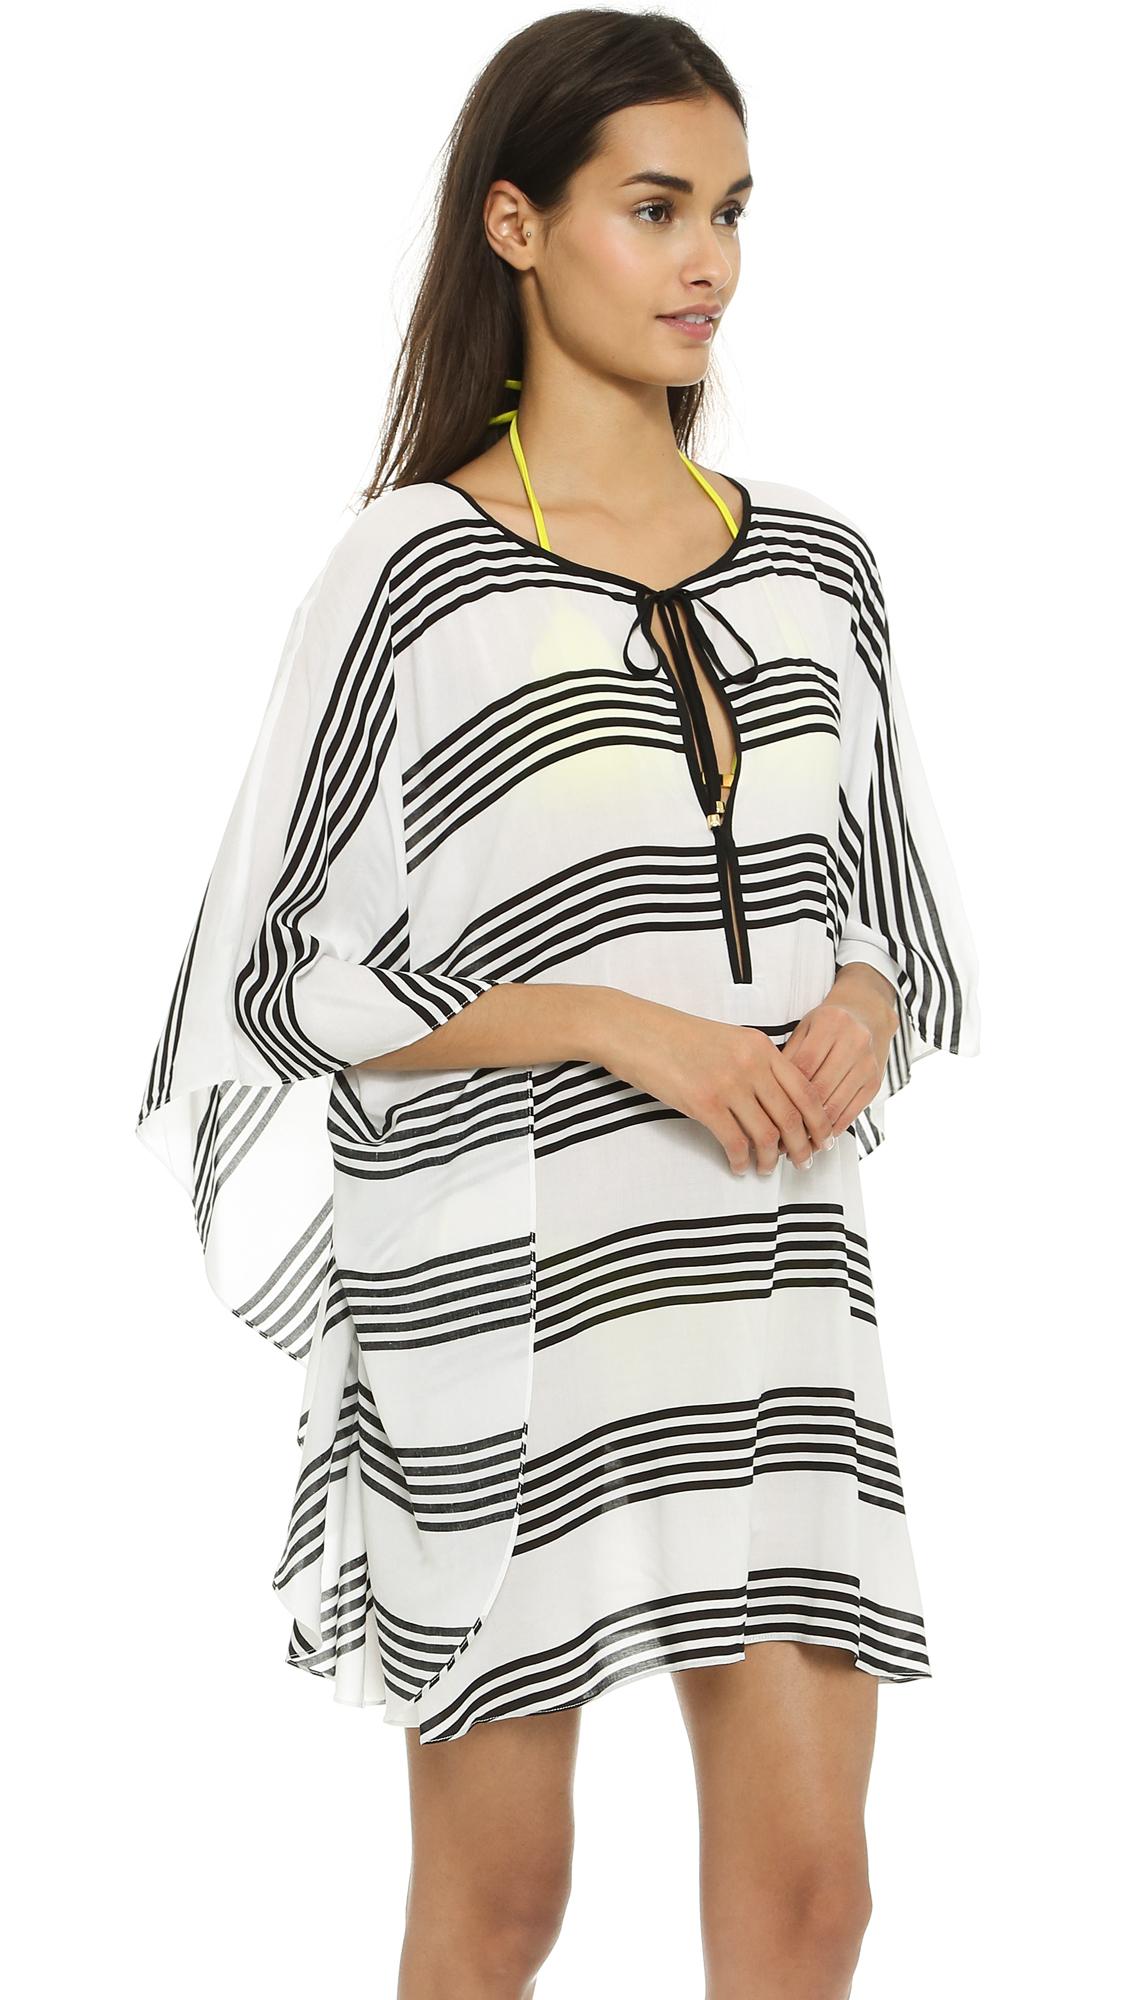 03862ae2303a5 Lyst - ViX Stripes Caftan - Stripes in White